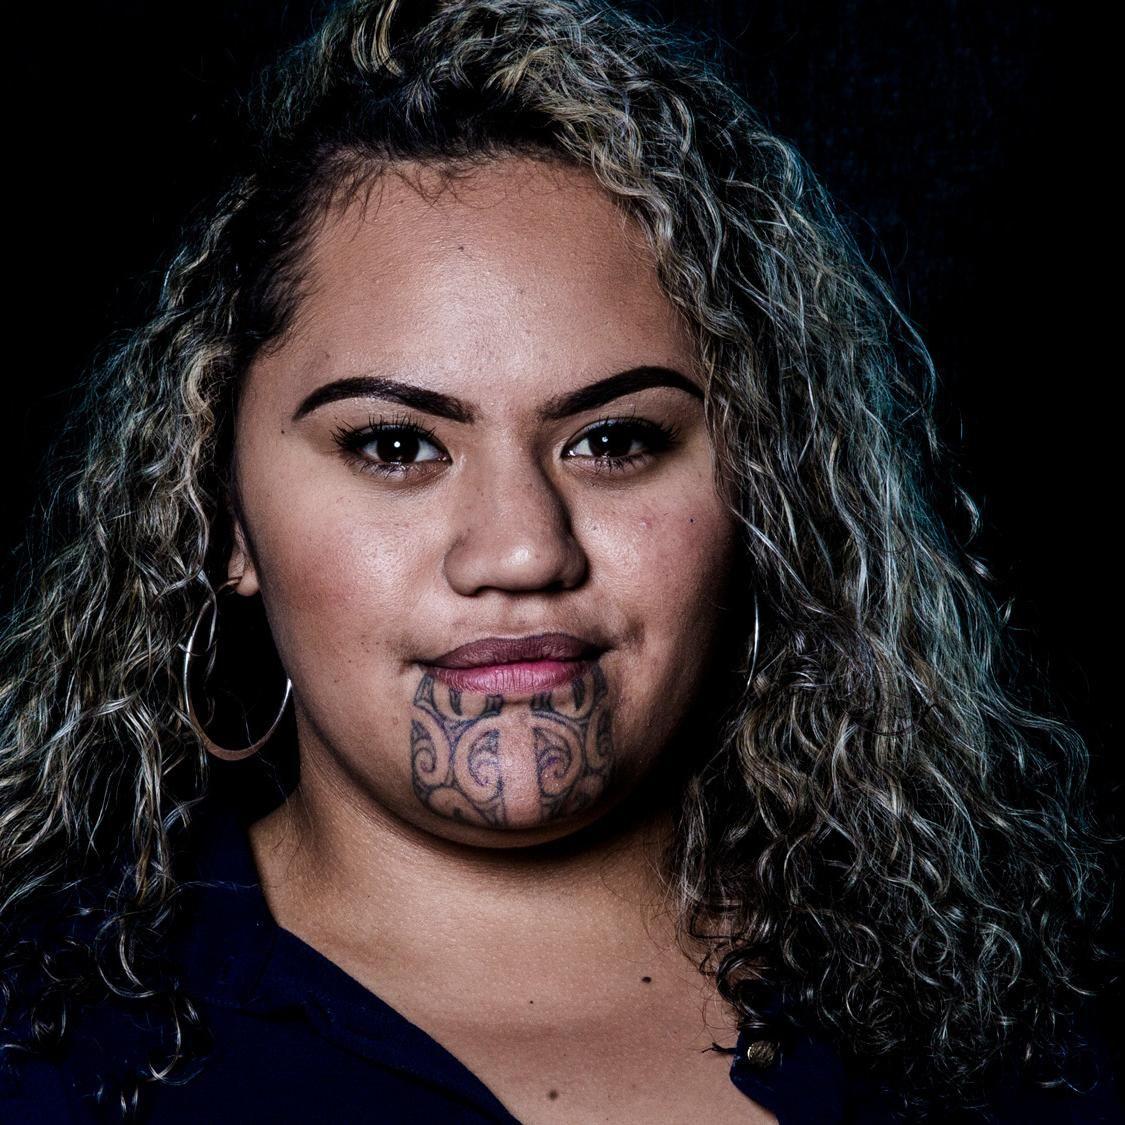 Moko Tattoo Maori: 'It's Transformative': Māori Women Talk About Their Sacred